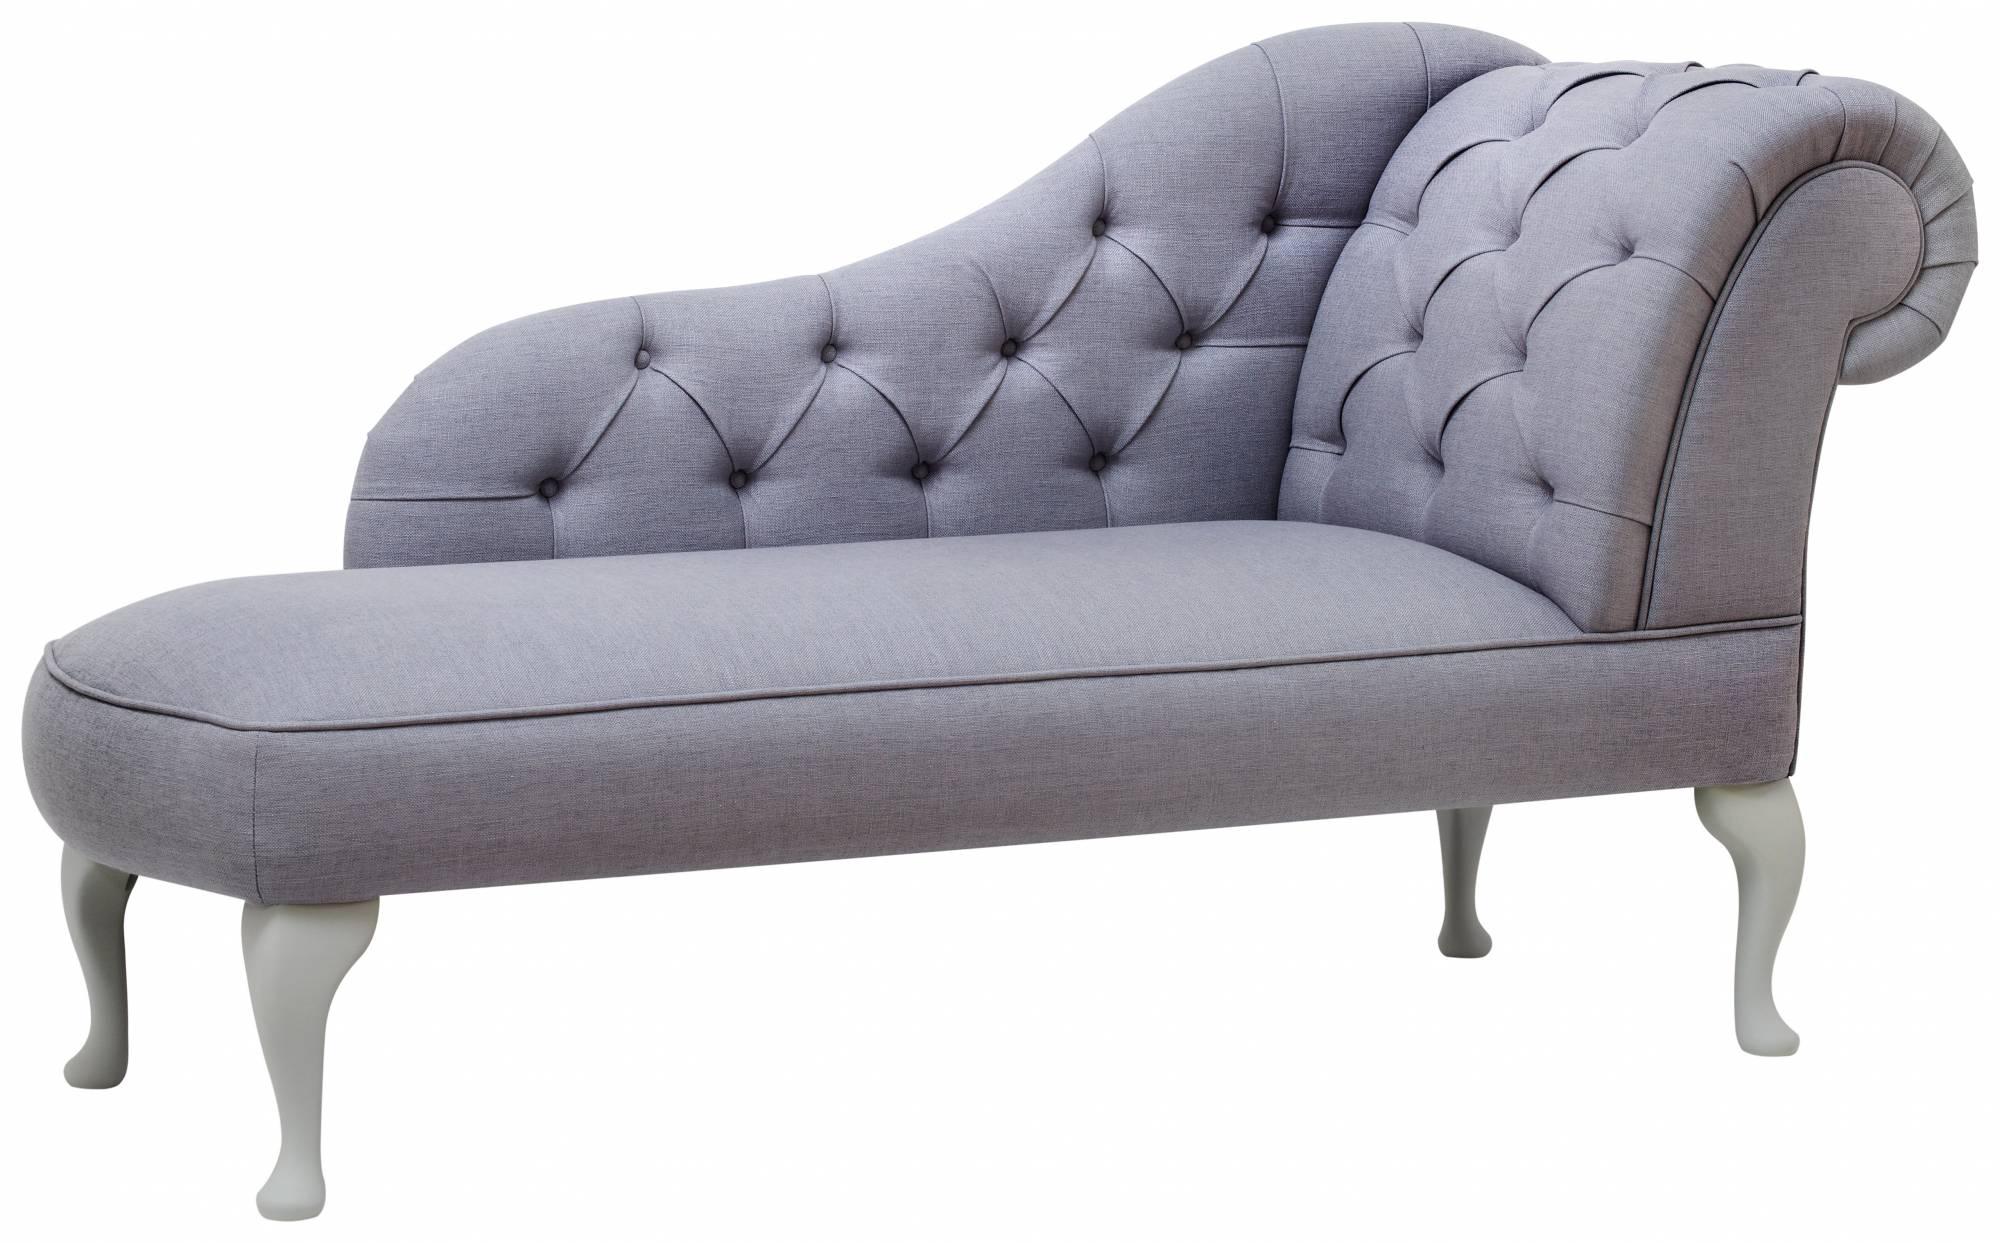 Stuart Jones Athens Chaise Beds Dodrefn Perkins Furniture